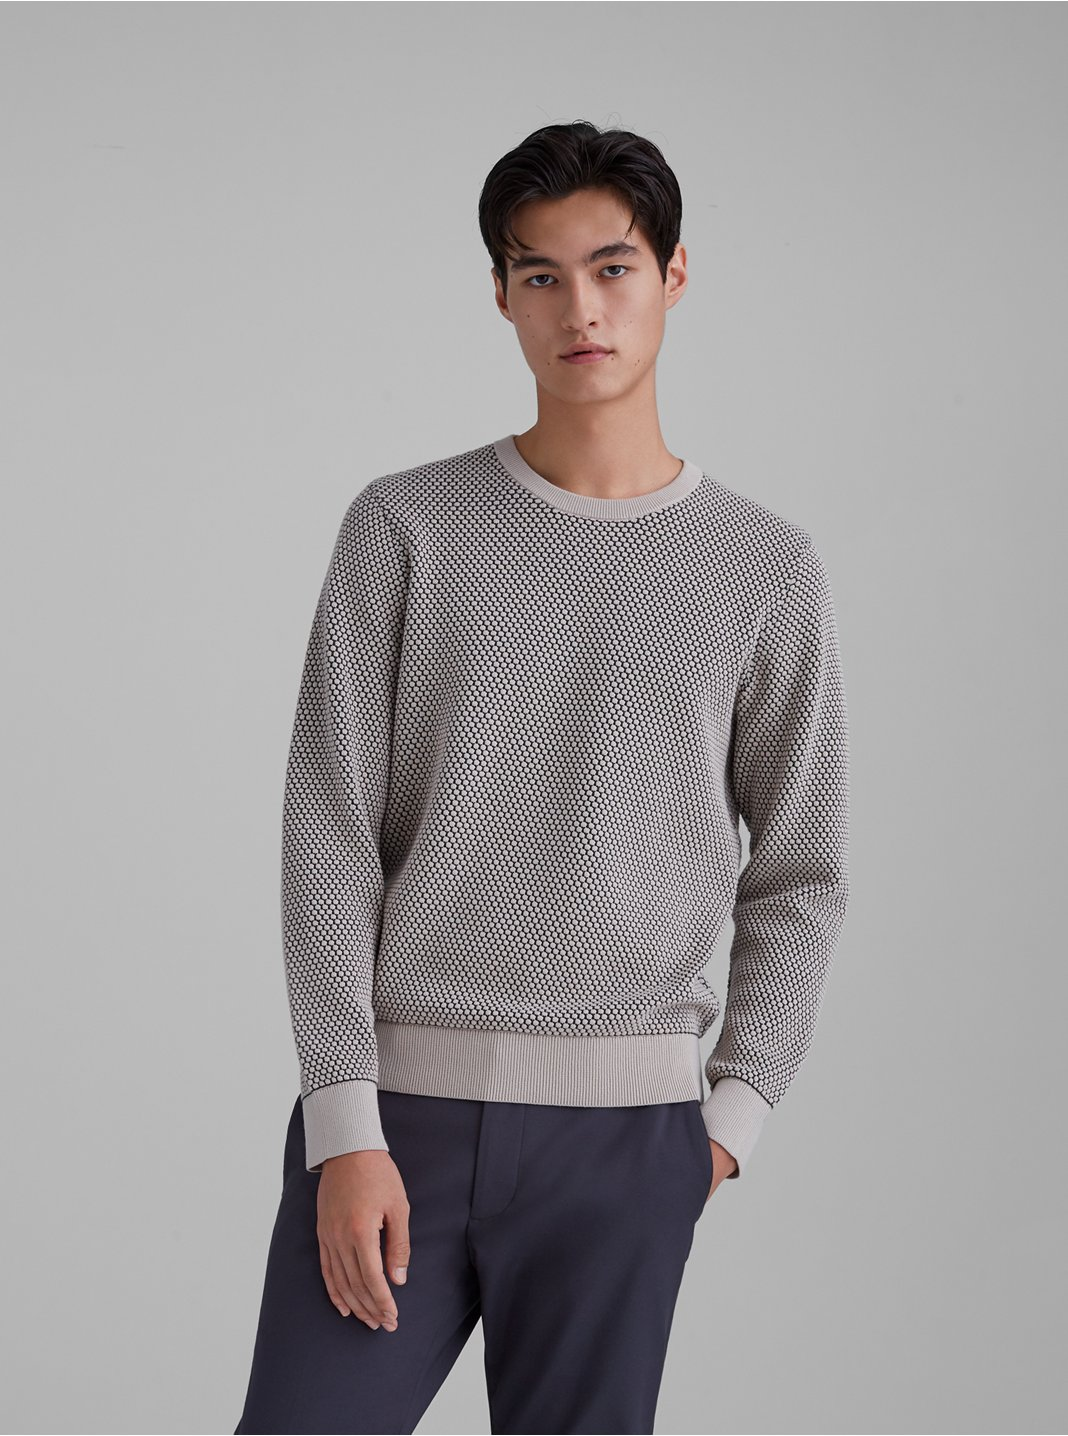 Honeycomb Knit Crewneck Sweater